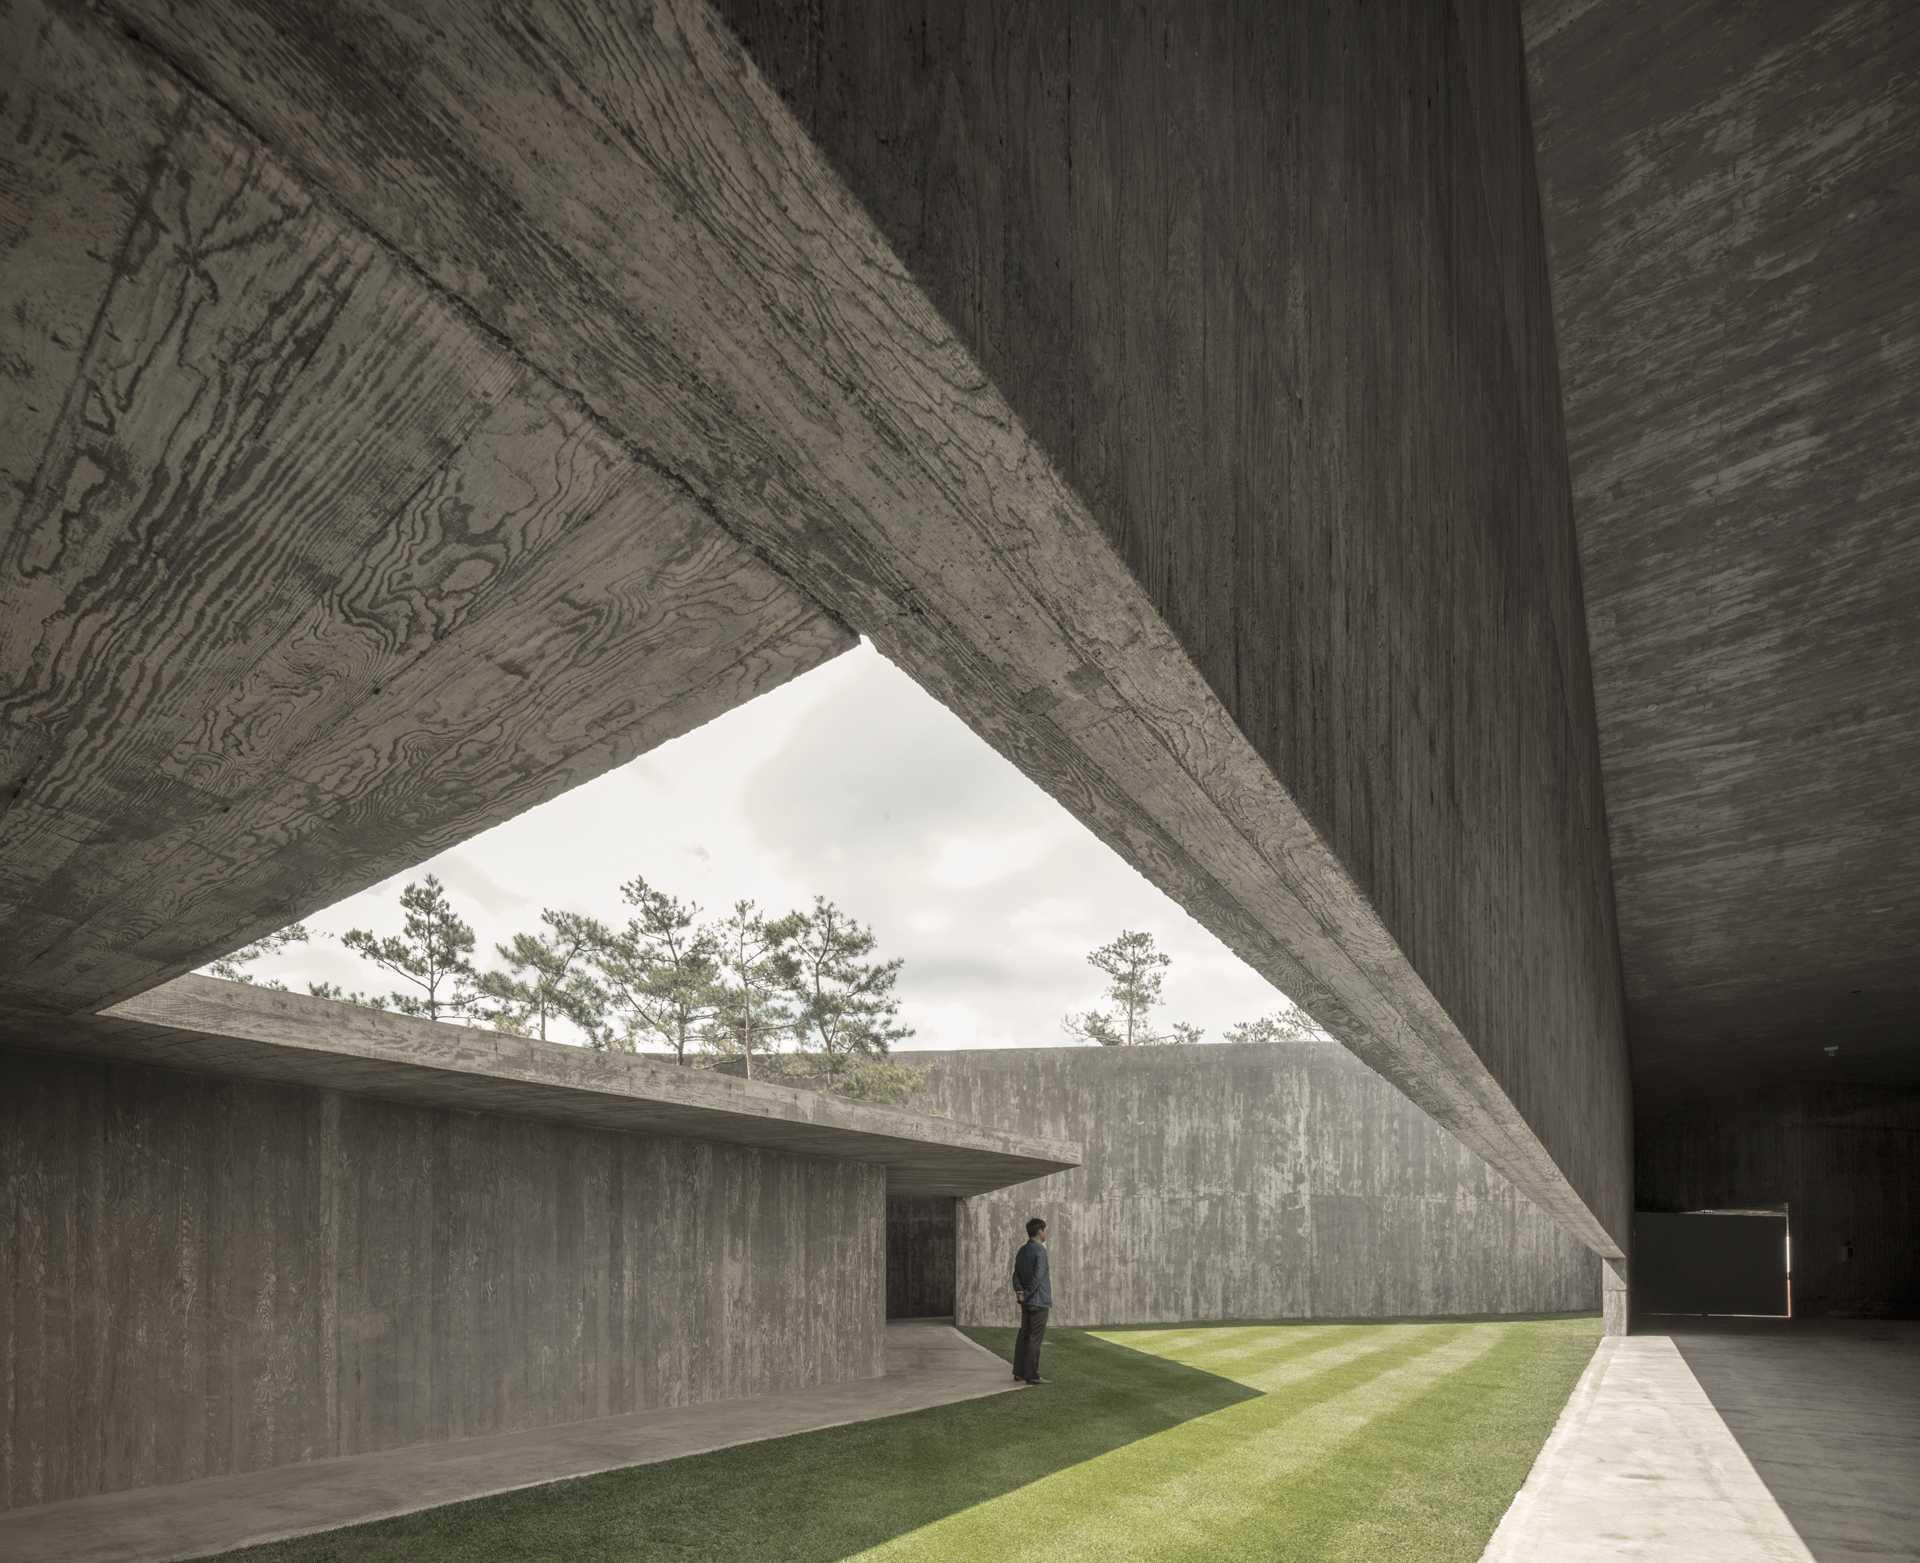 Art Pavilion in Saya Park  - 21 9 49